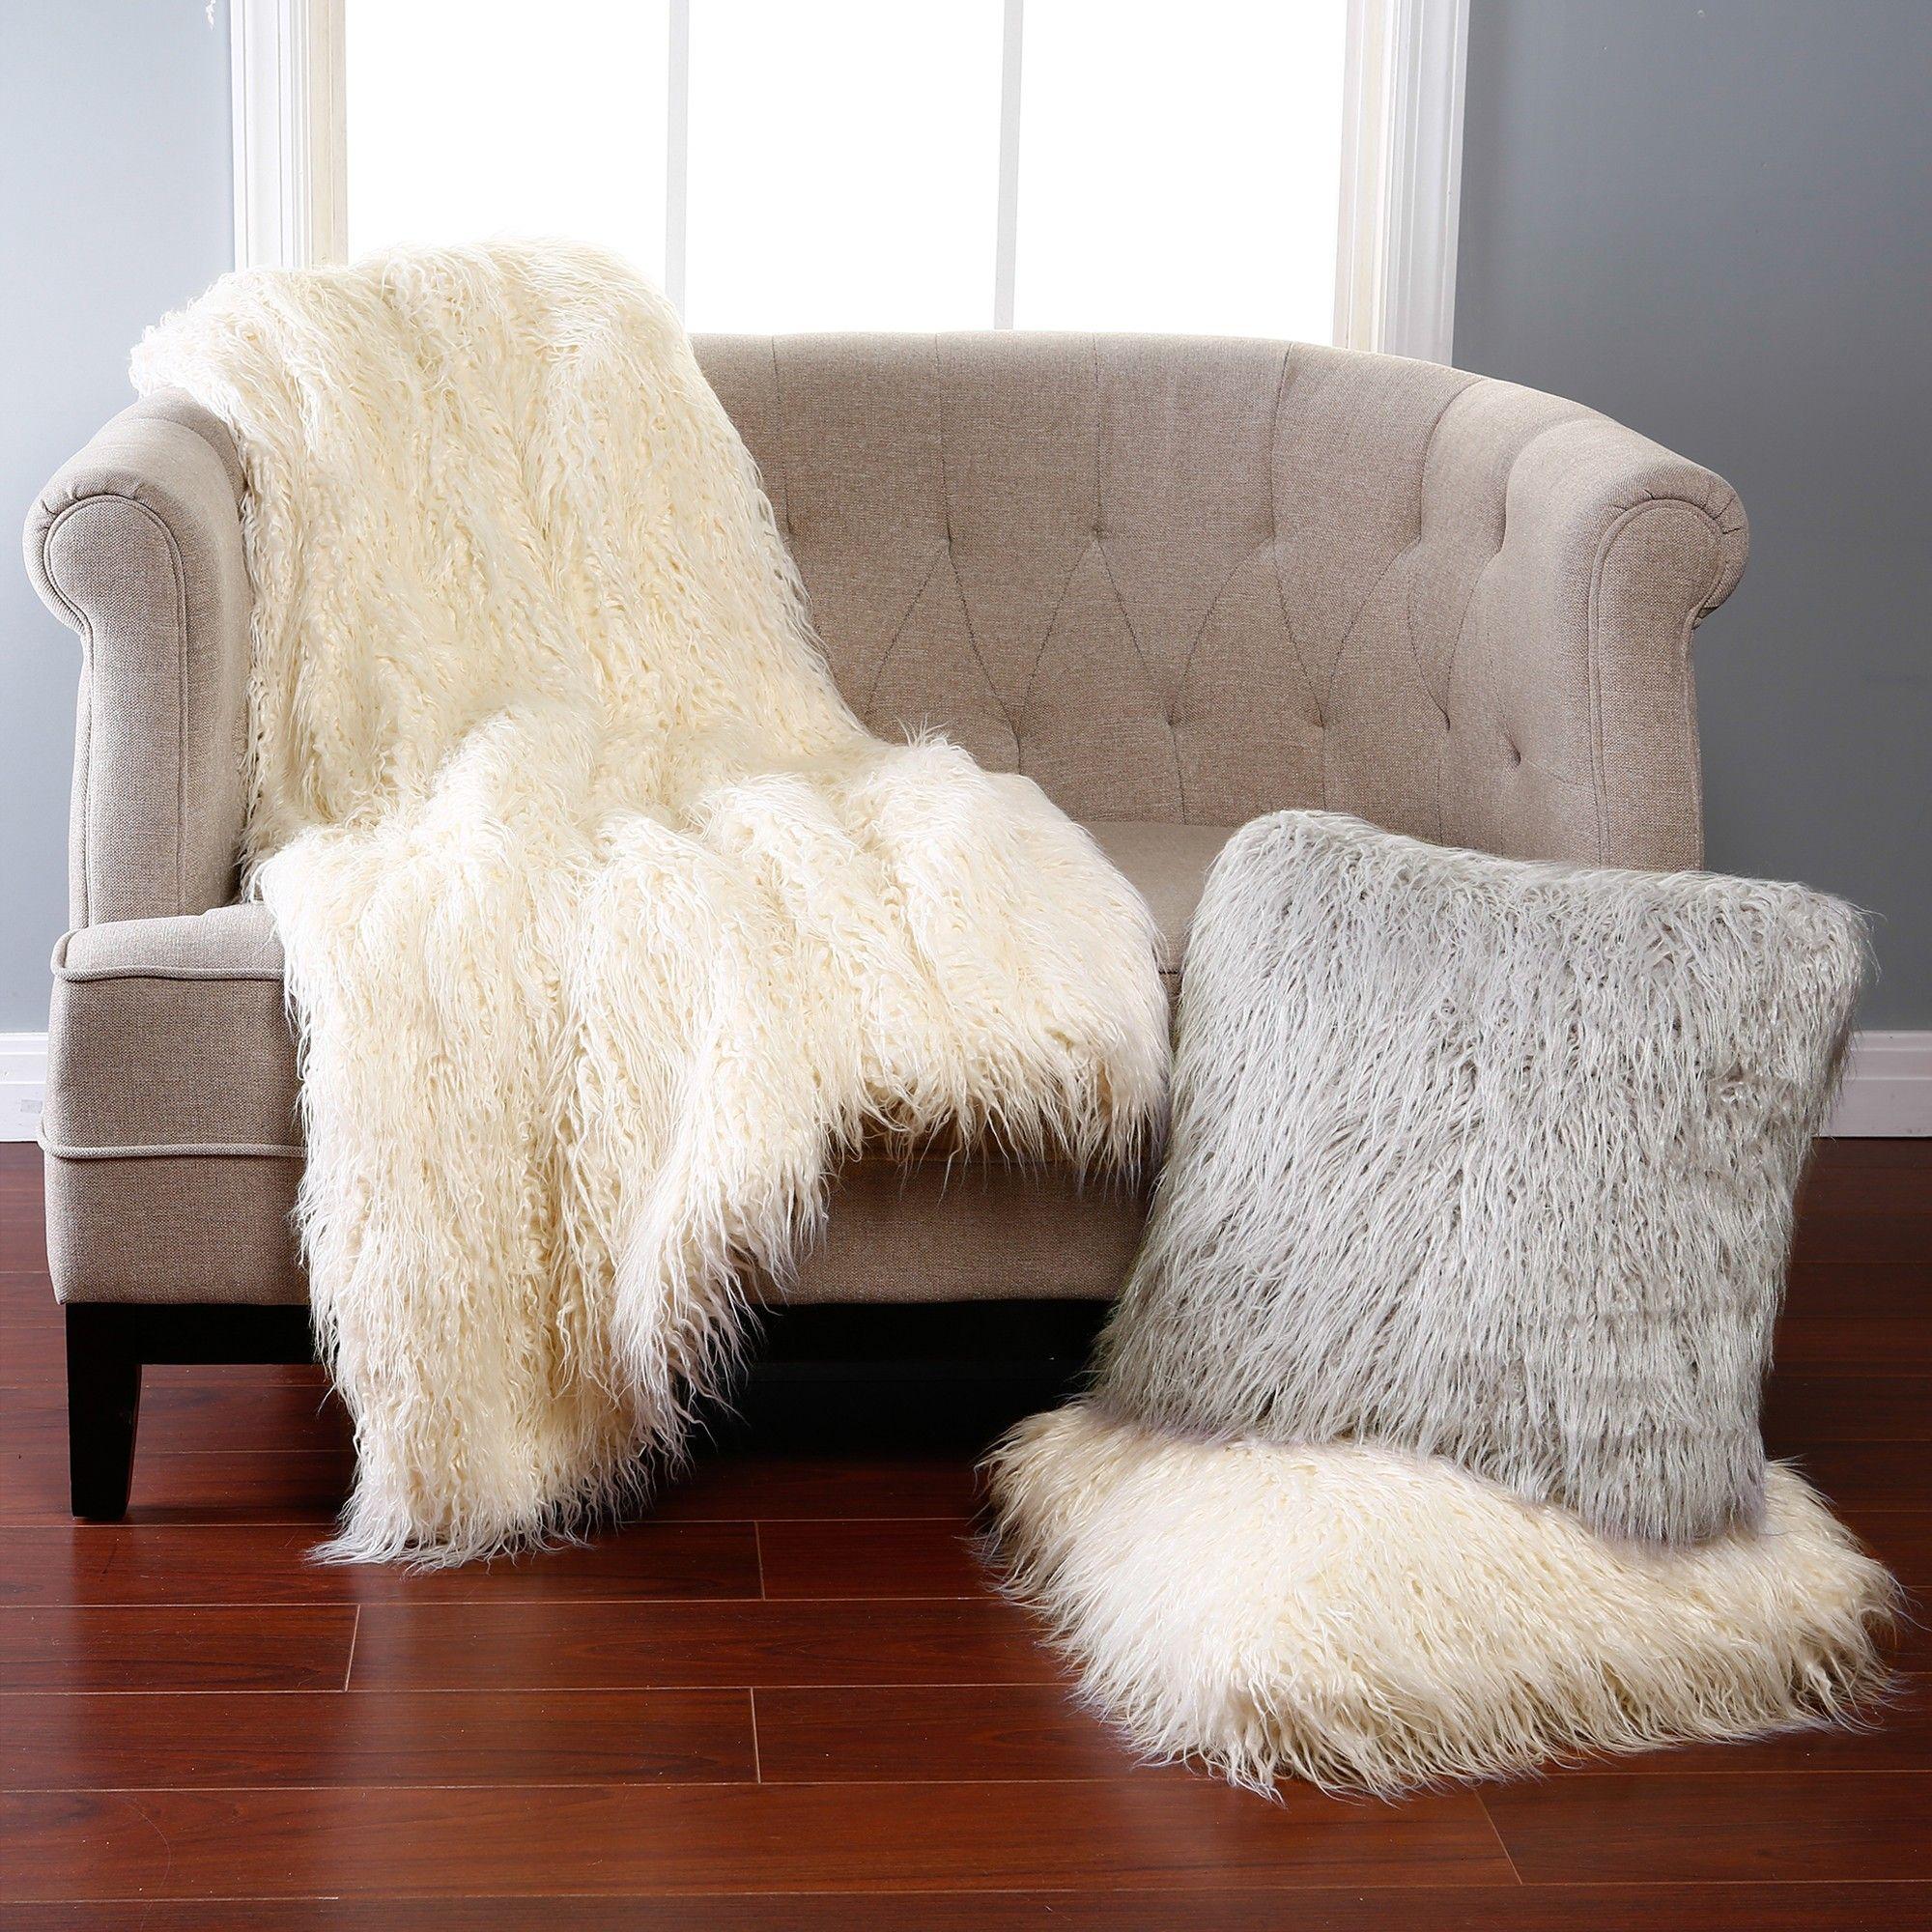 White Sofa Throw Winter Living Room Decor White Faux Fur Rug Sofa Throw